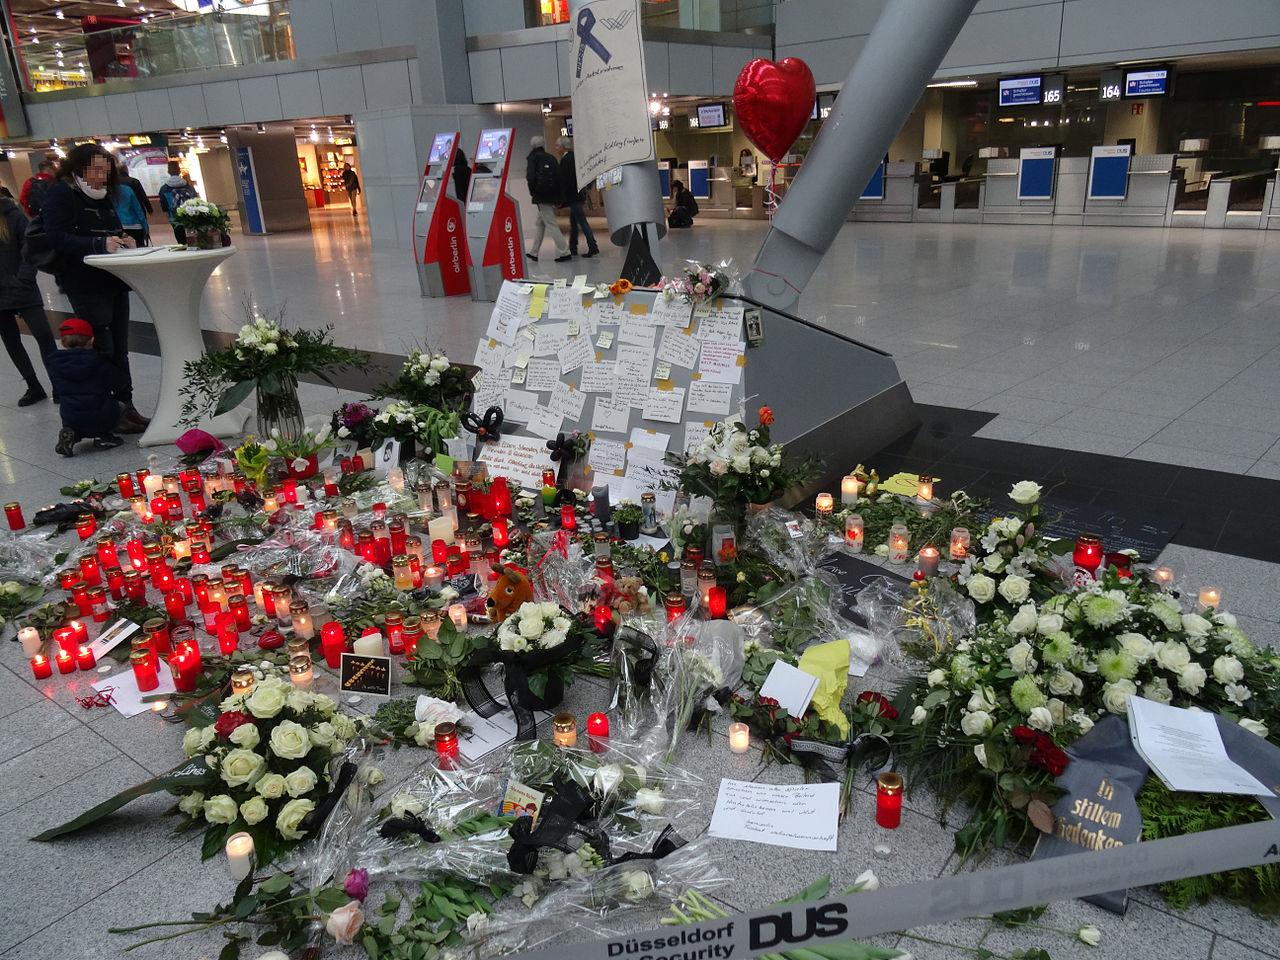 4U9525 Memorial at Düsseldorf Airport.jpg